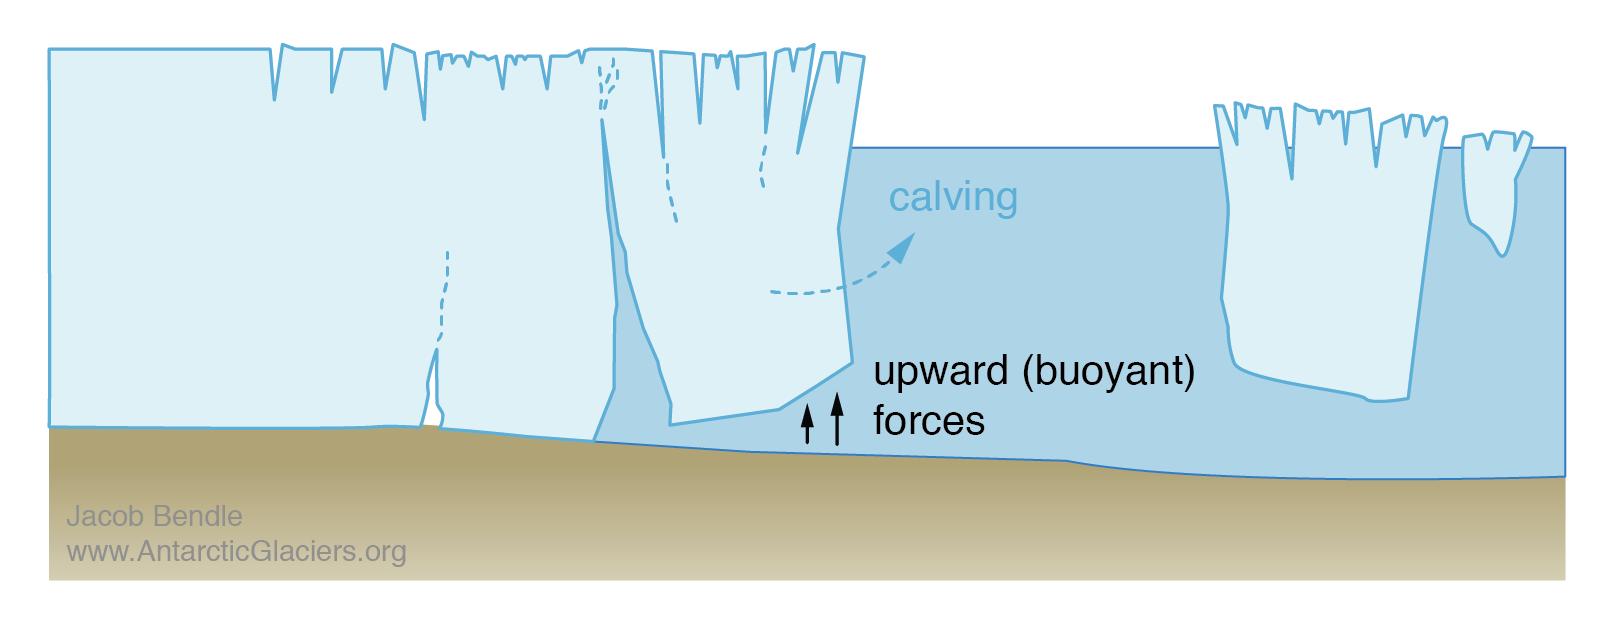 antarctic-largest-iceberg-what-is-calving-event